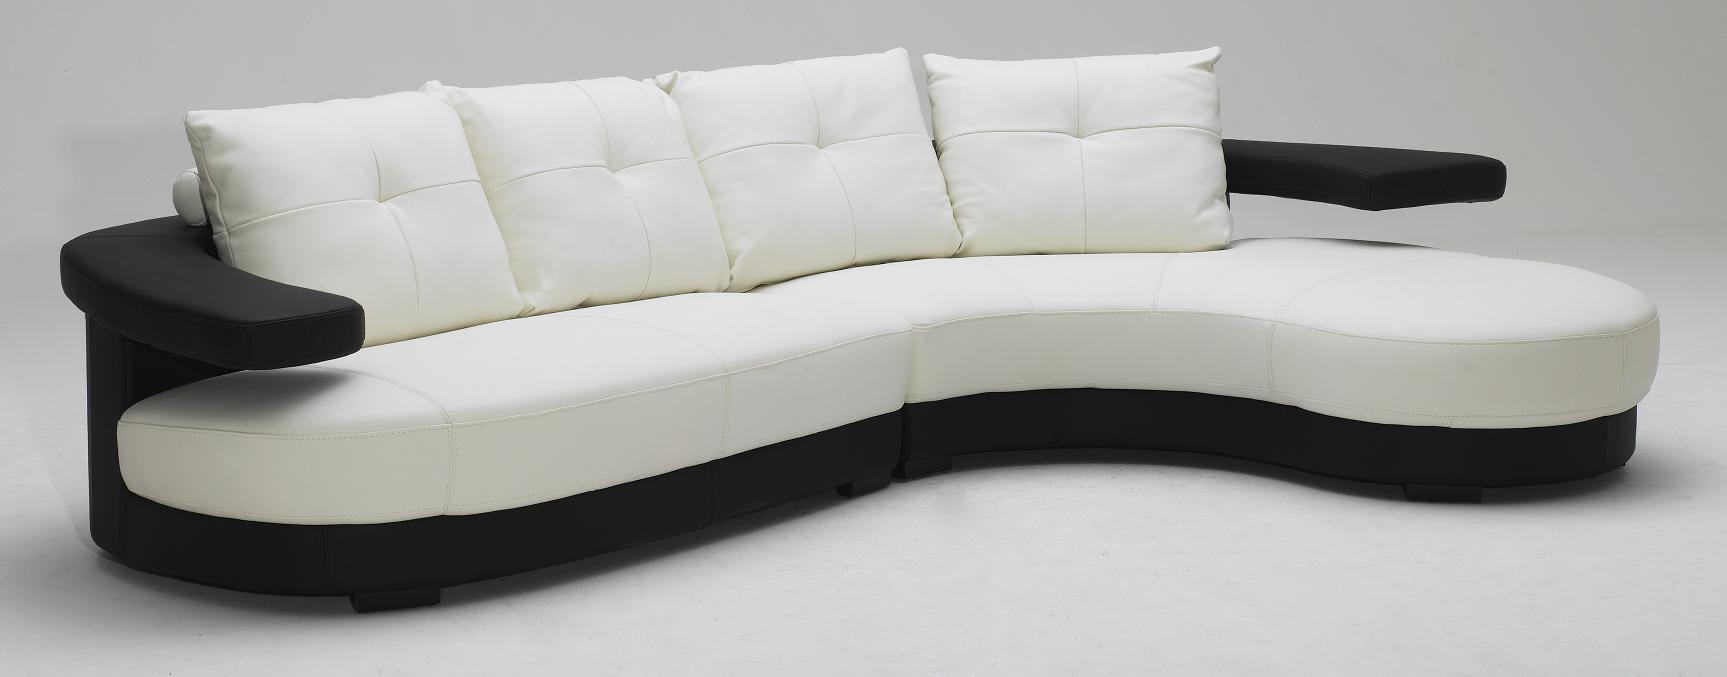 the-best-designer-contemporary-sofas-perfect-ideas